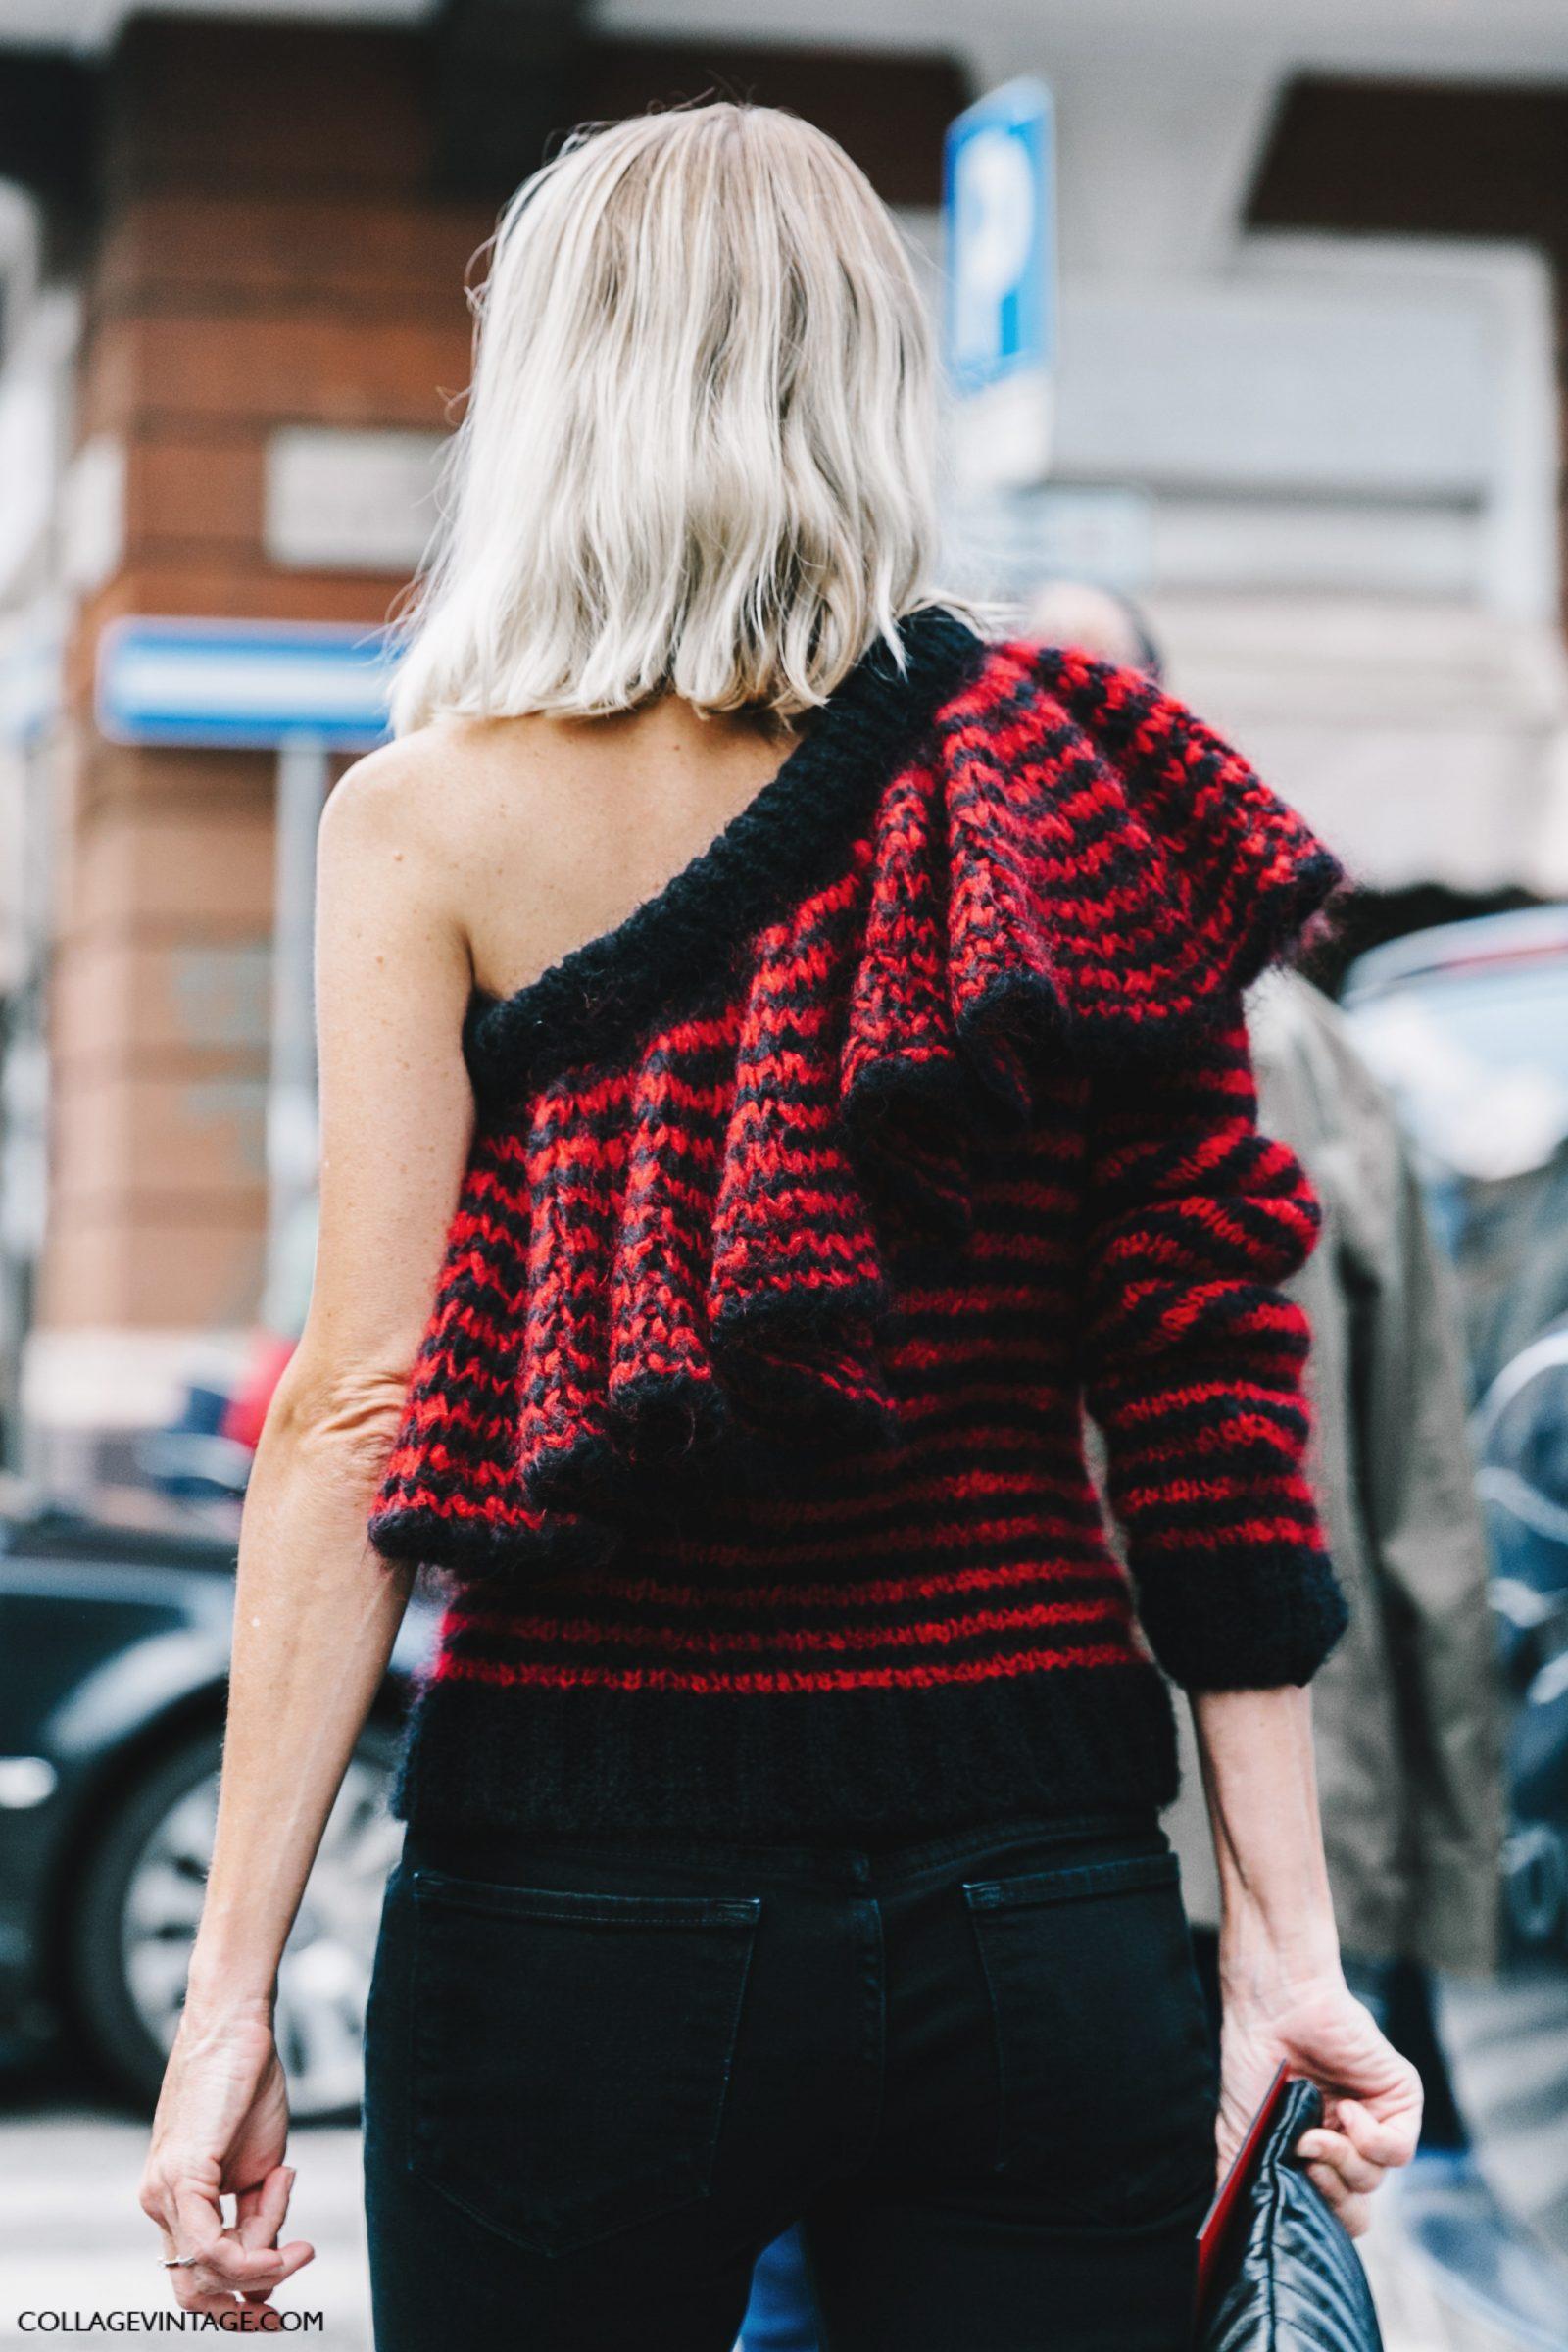 mfw-milan_fashion_week_ss17-street_style-outfits-collage_vintage-gucci-numero_21-alberta_ferreti-178